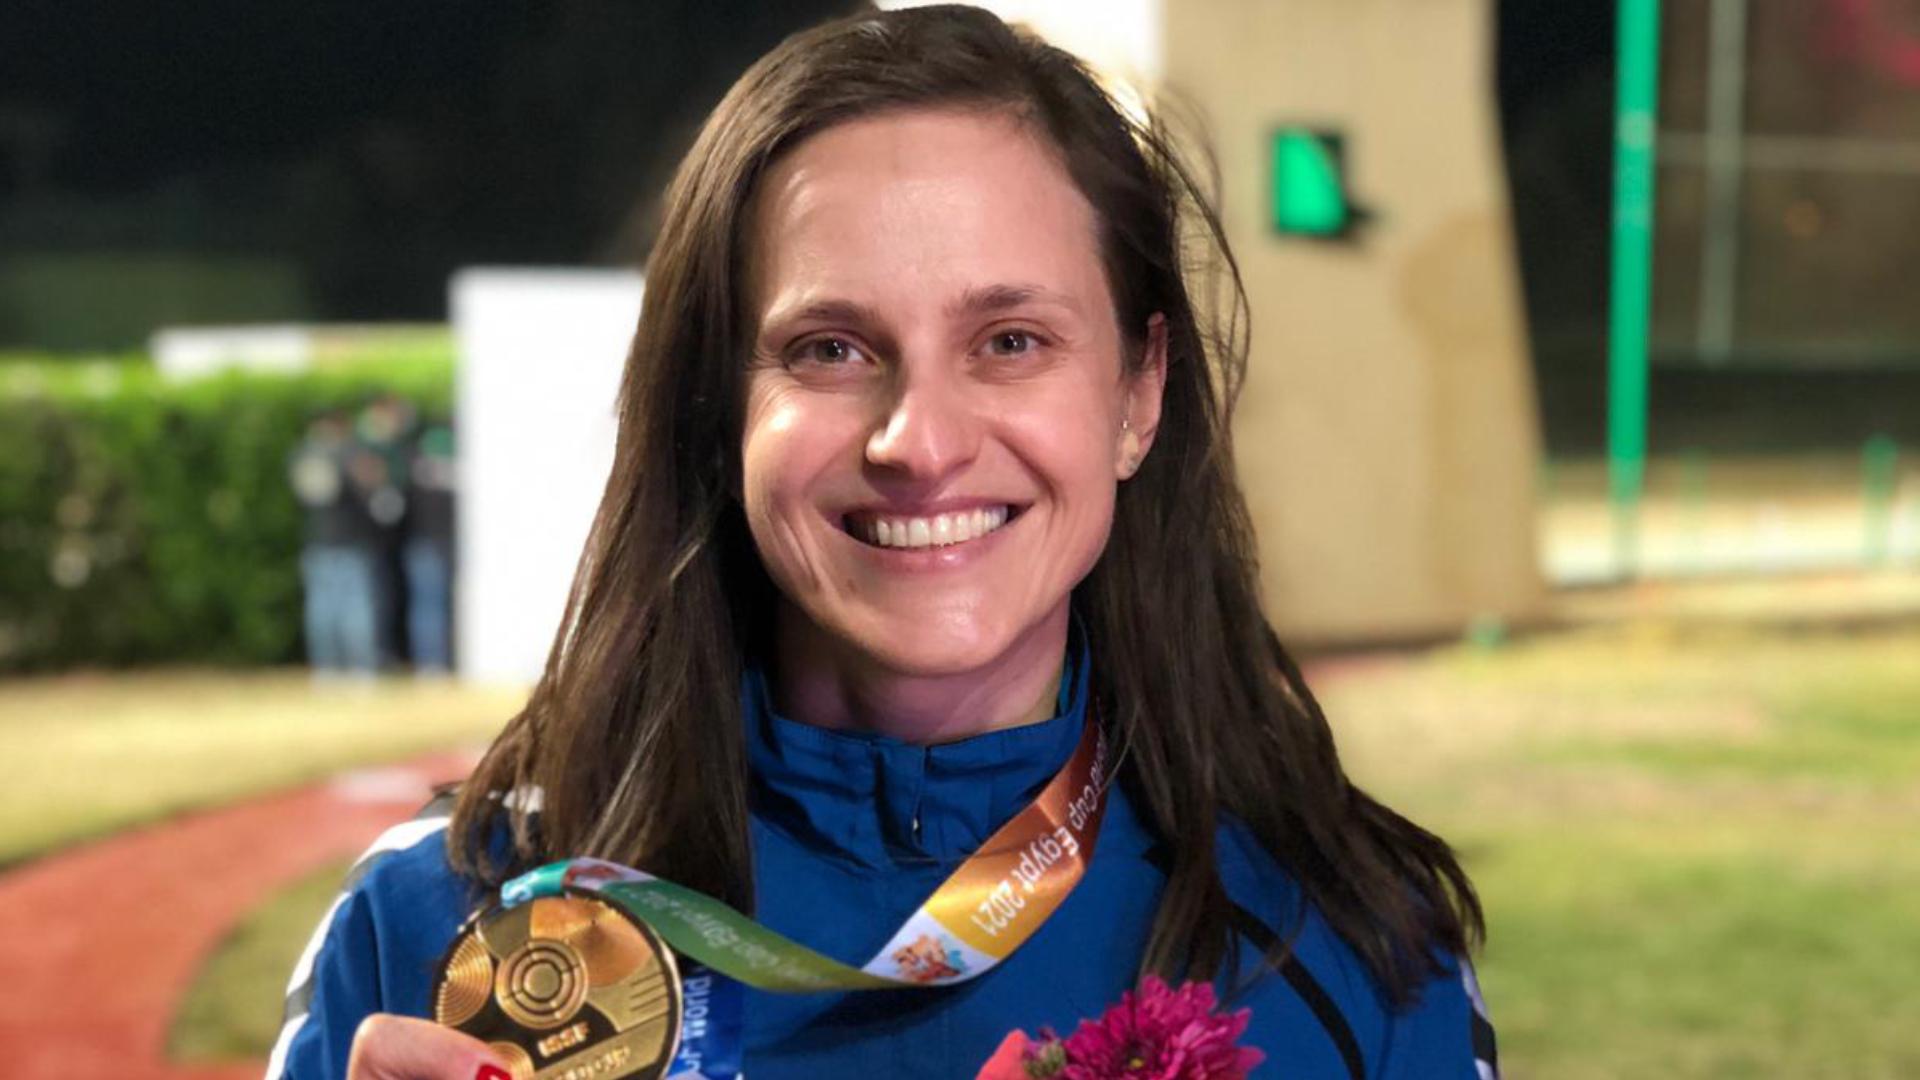 SHOTGUN. DANKA BARTEKOVA WINS FIOCCHI TEAM'S FIRST GOLD MEDAL IN CAIRO